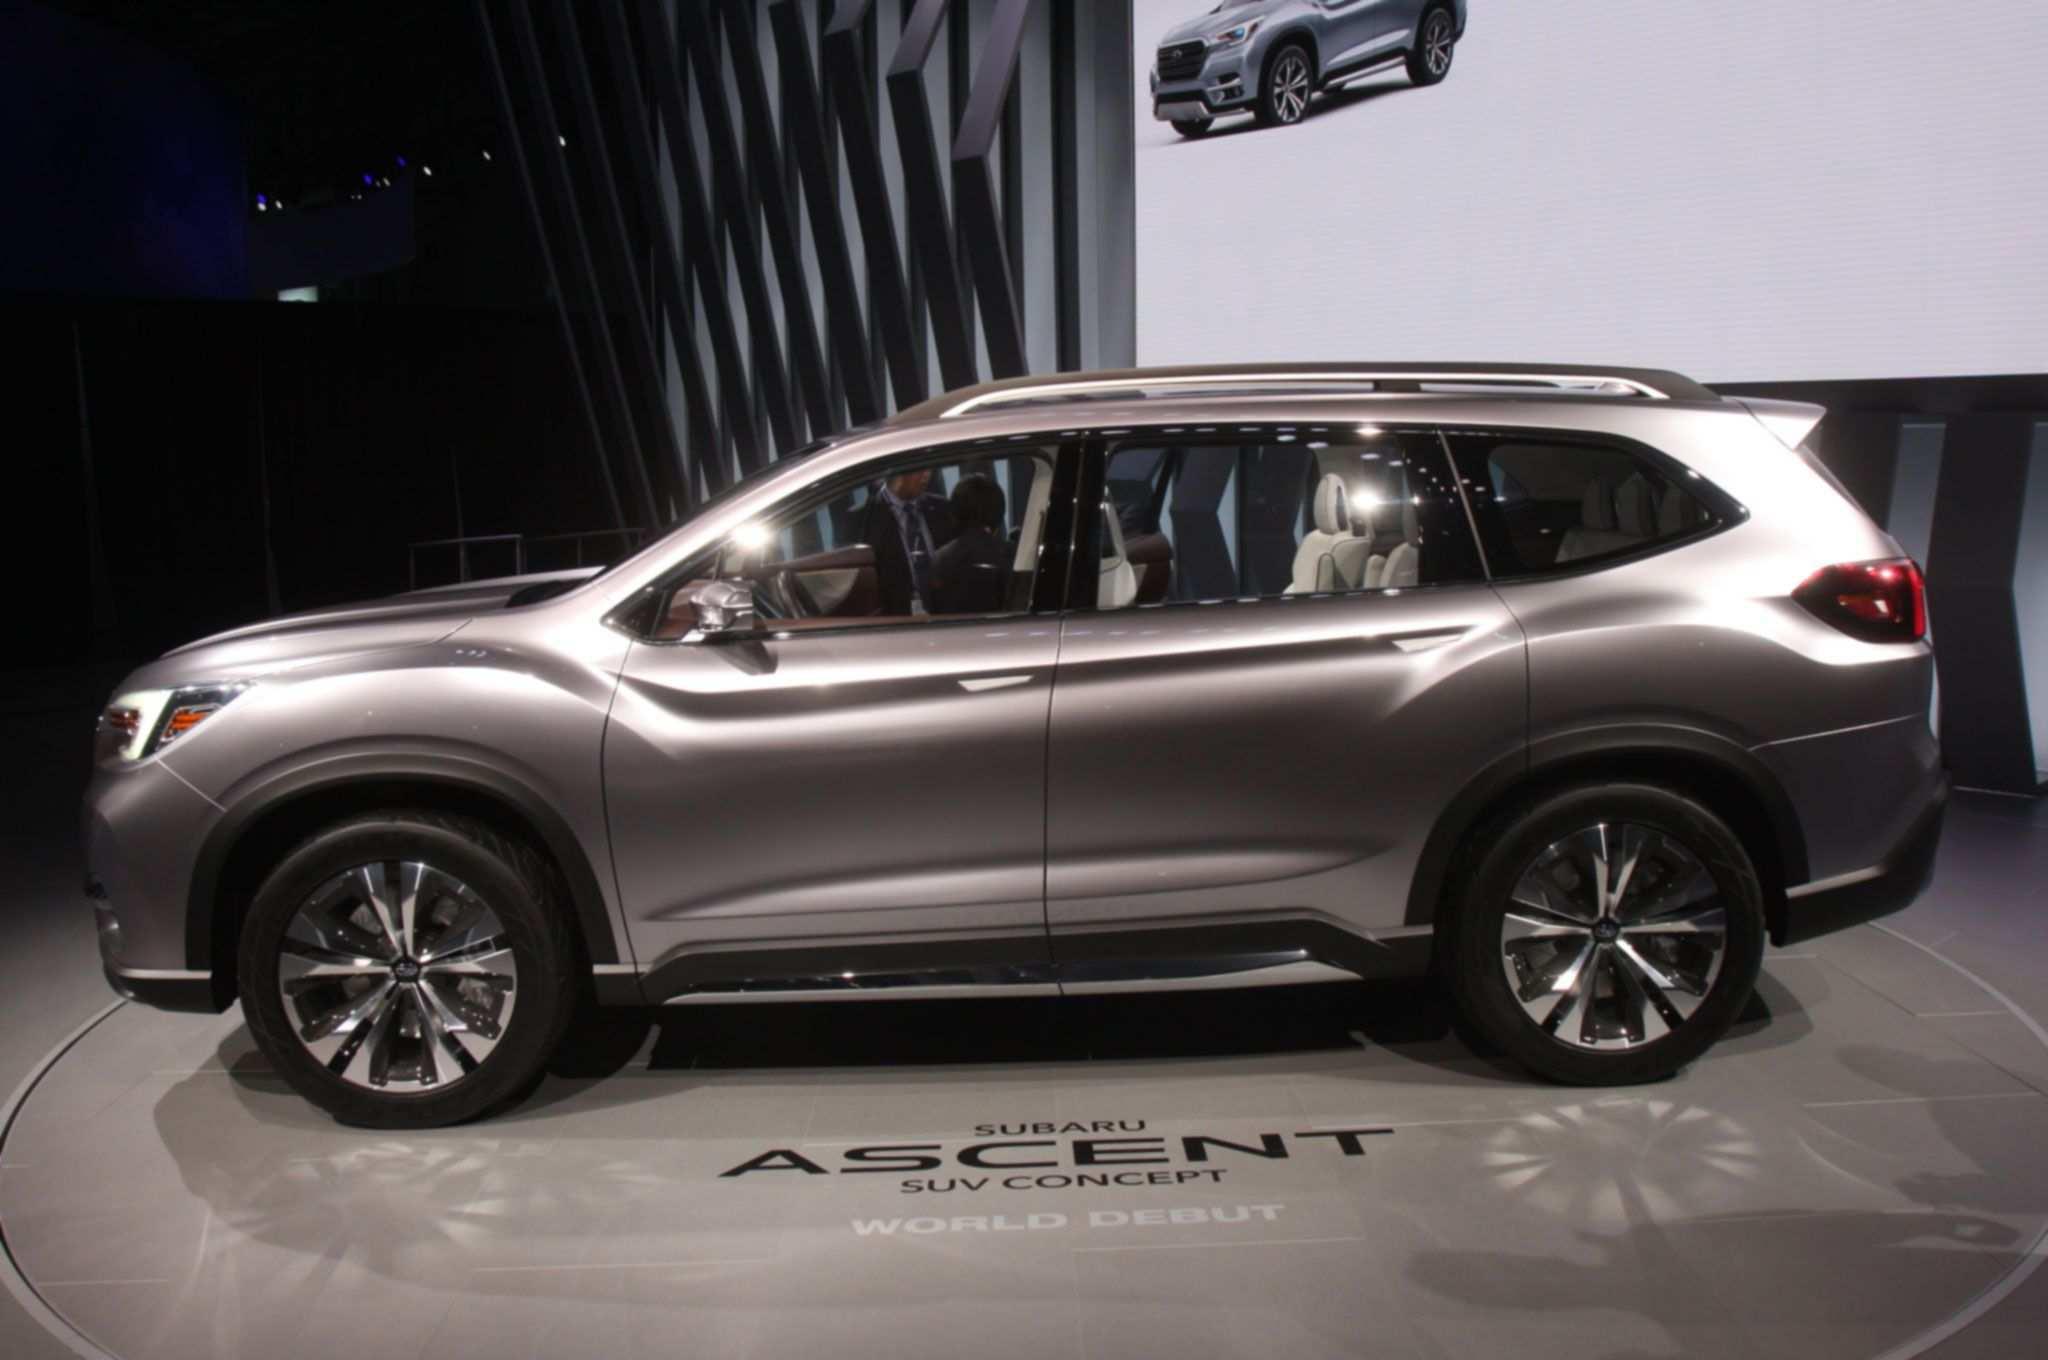 92 Best Review 2020 Subaru Ascent GVWr Review with 2020 Subaru Ascent GVWr